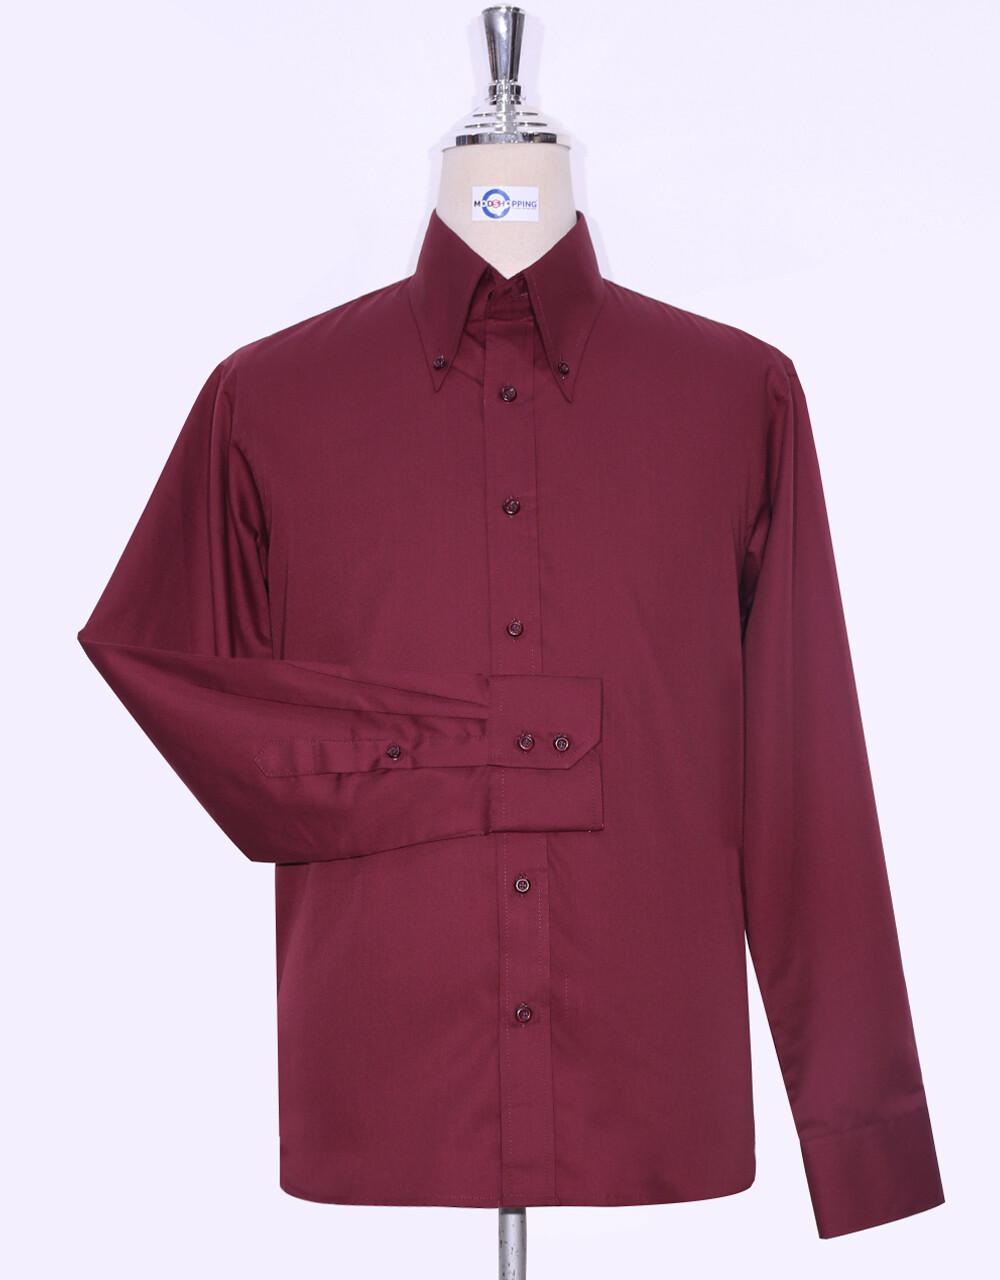 Button-Down Collar Shirt   Burgundy Color Shirt